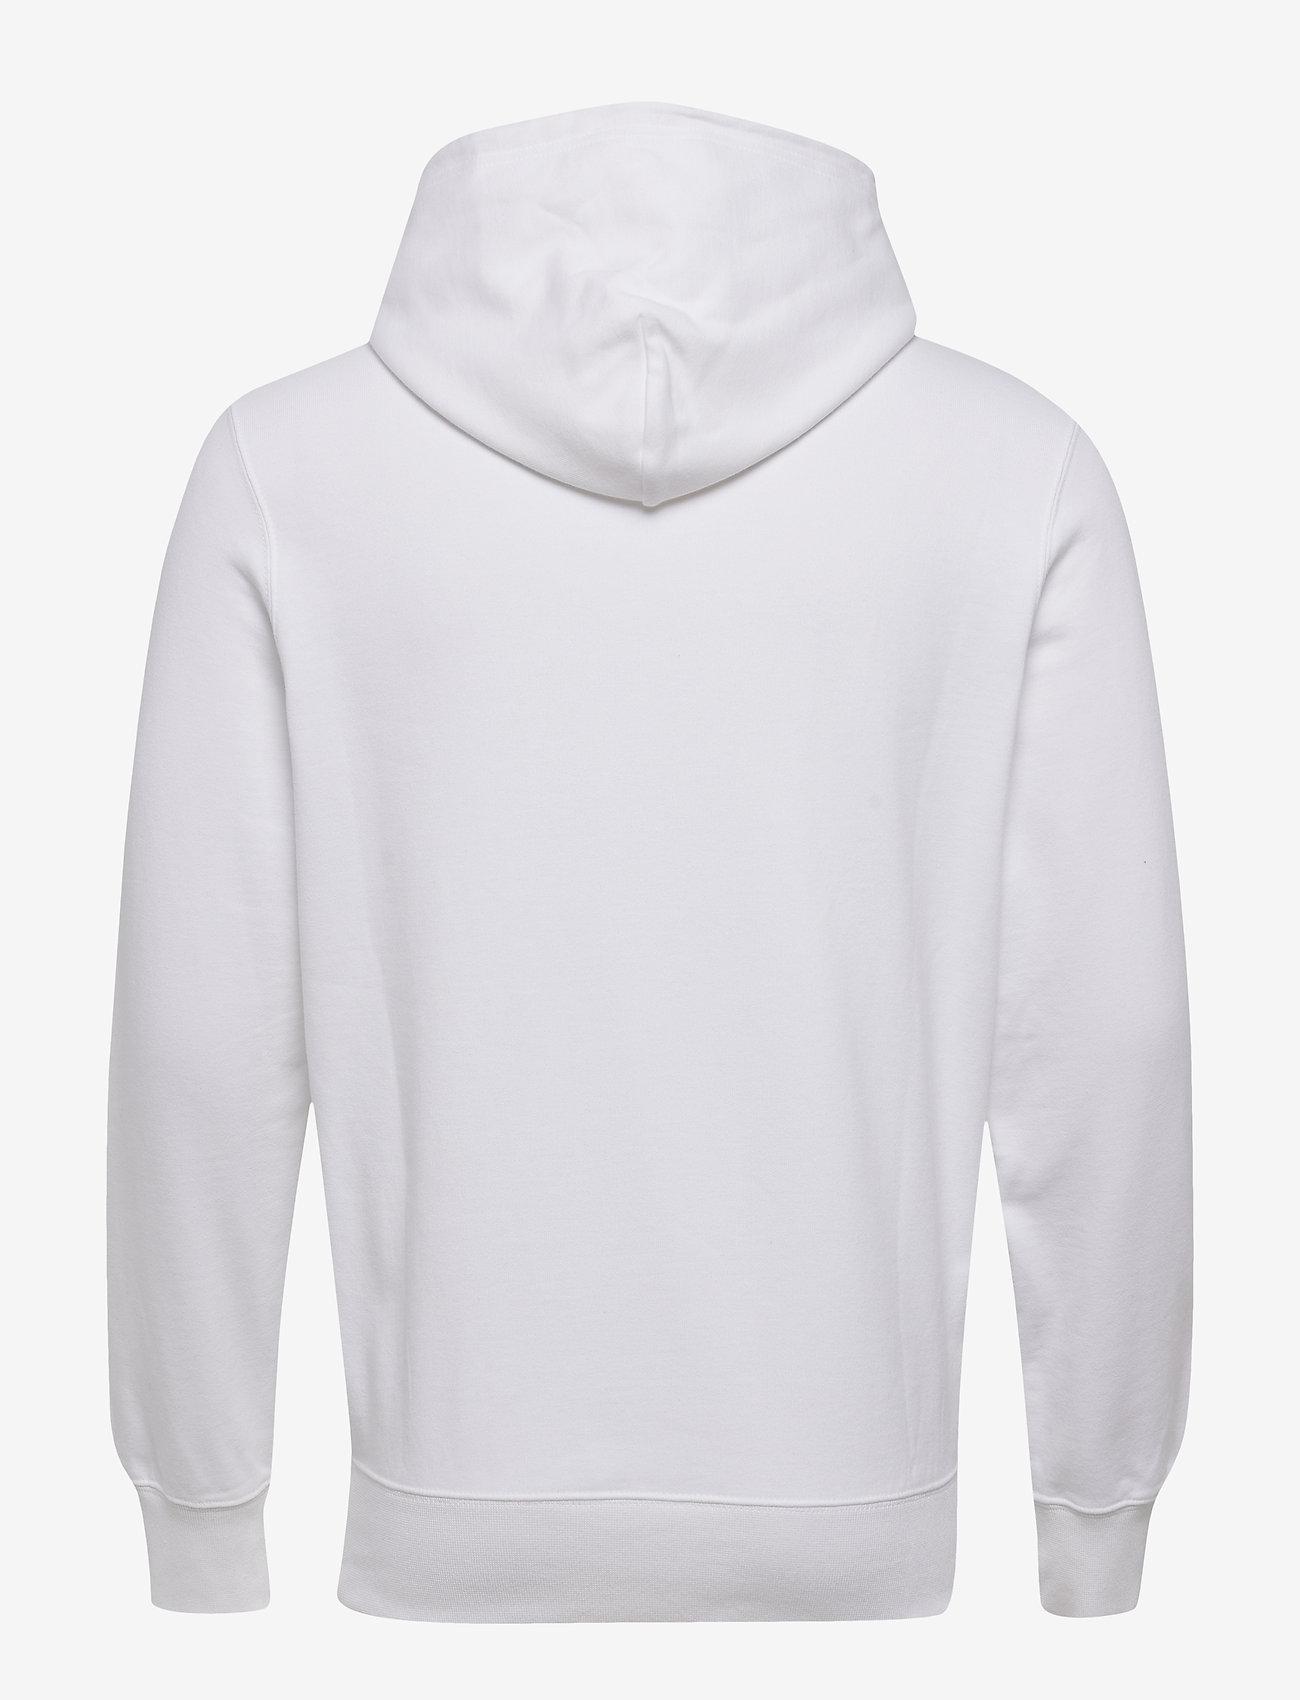 Champion Hooded Sweatshirt - Sweatshirts WHITE - Menn Klær